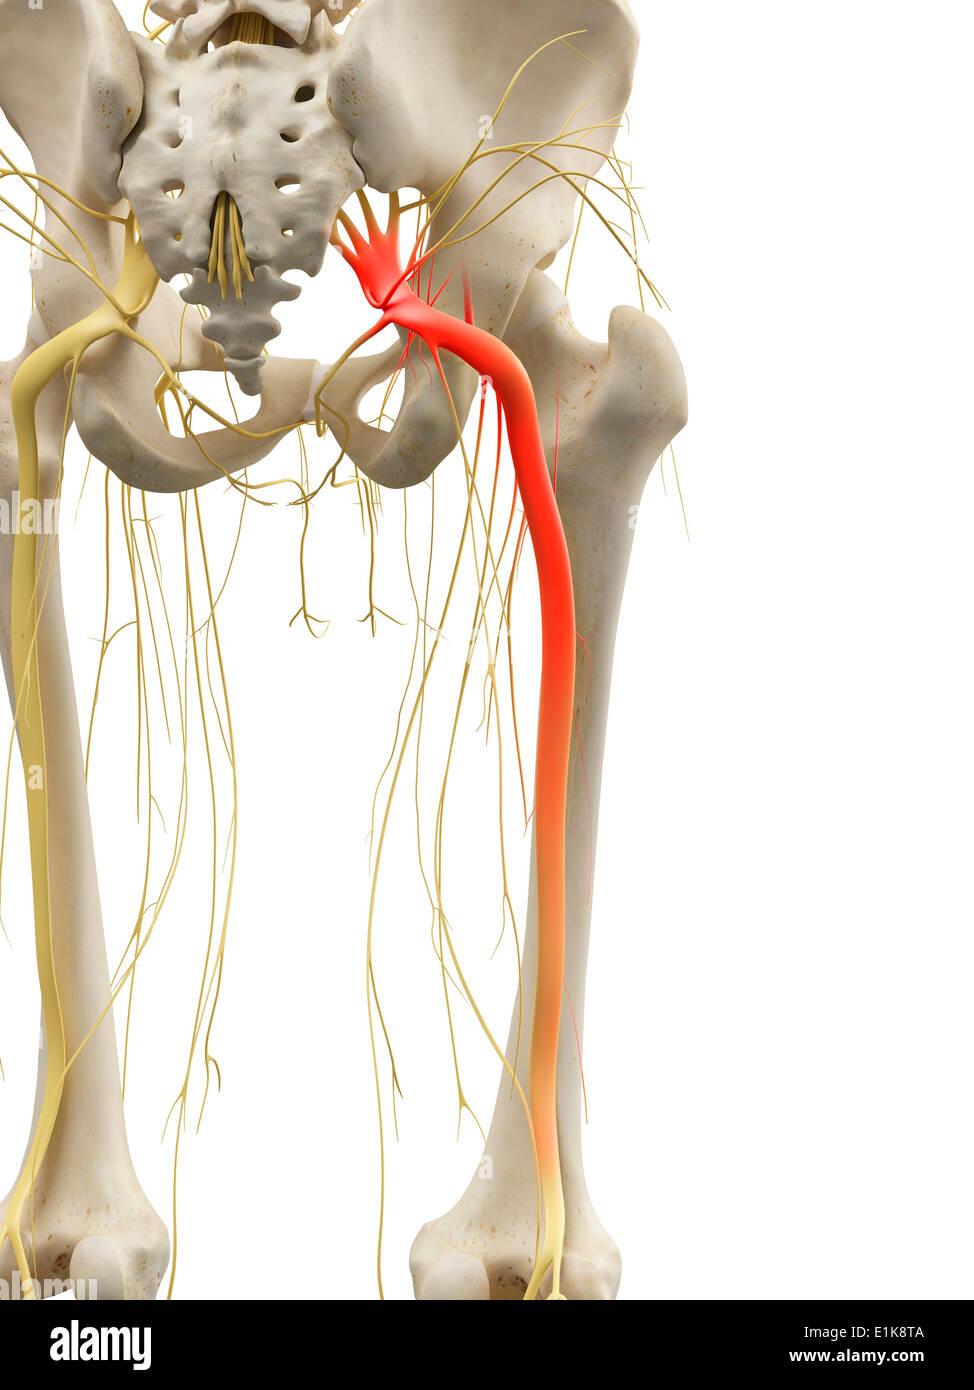 Human Sciatic Nerve Computer Artwork Stock Photo 69880170 Alamy